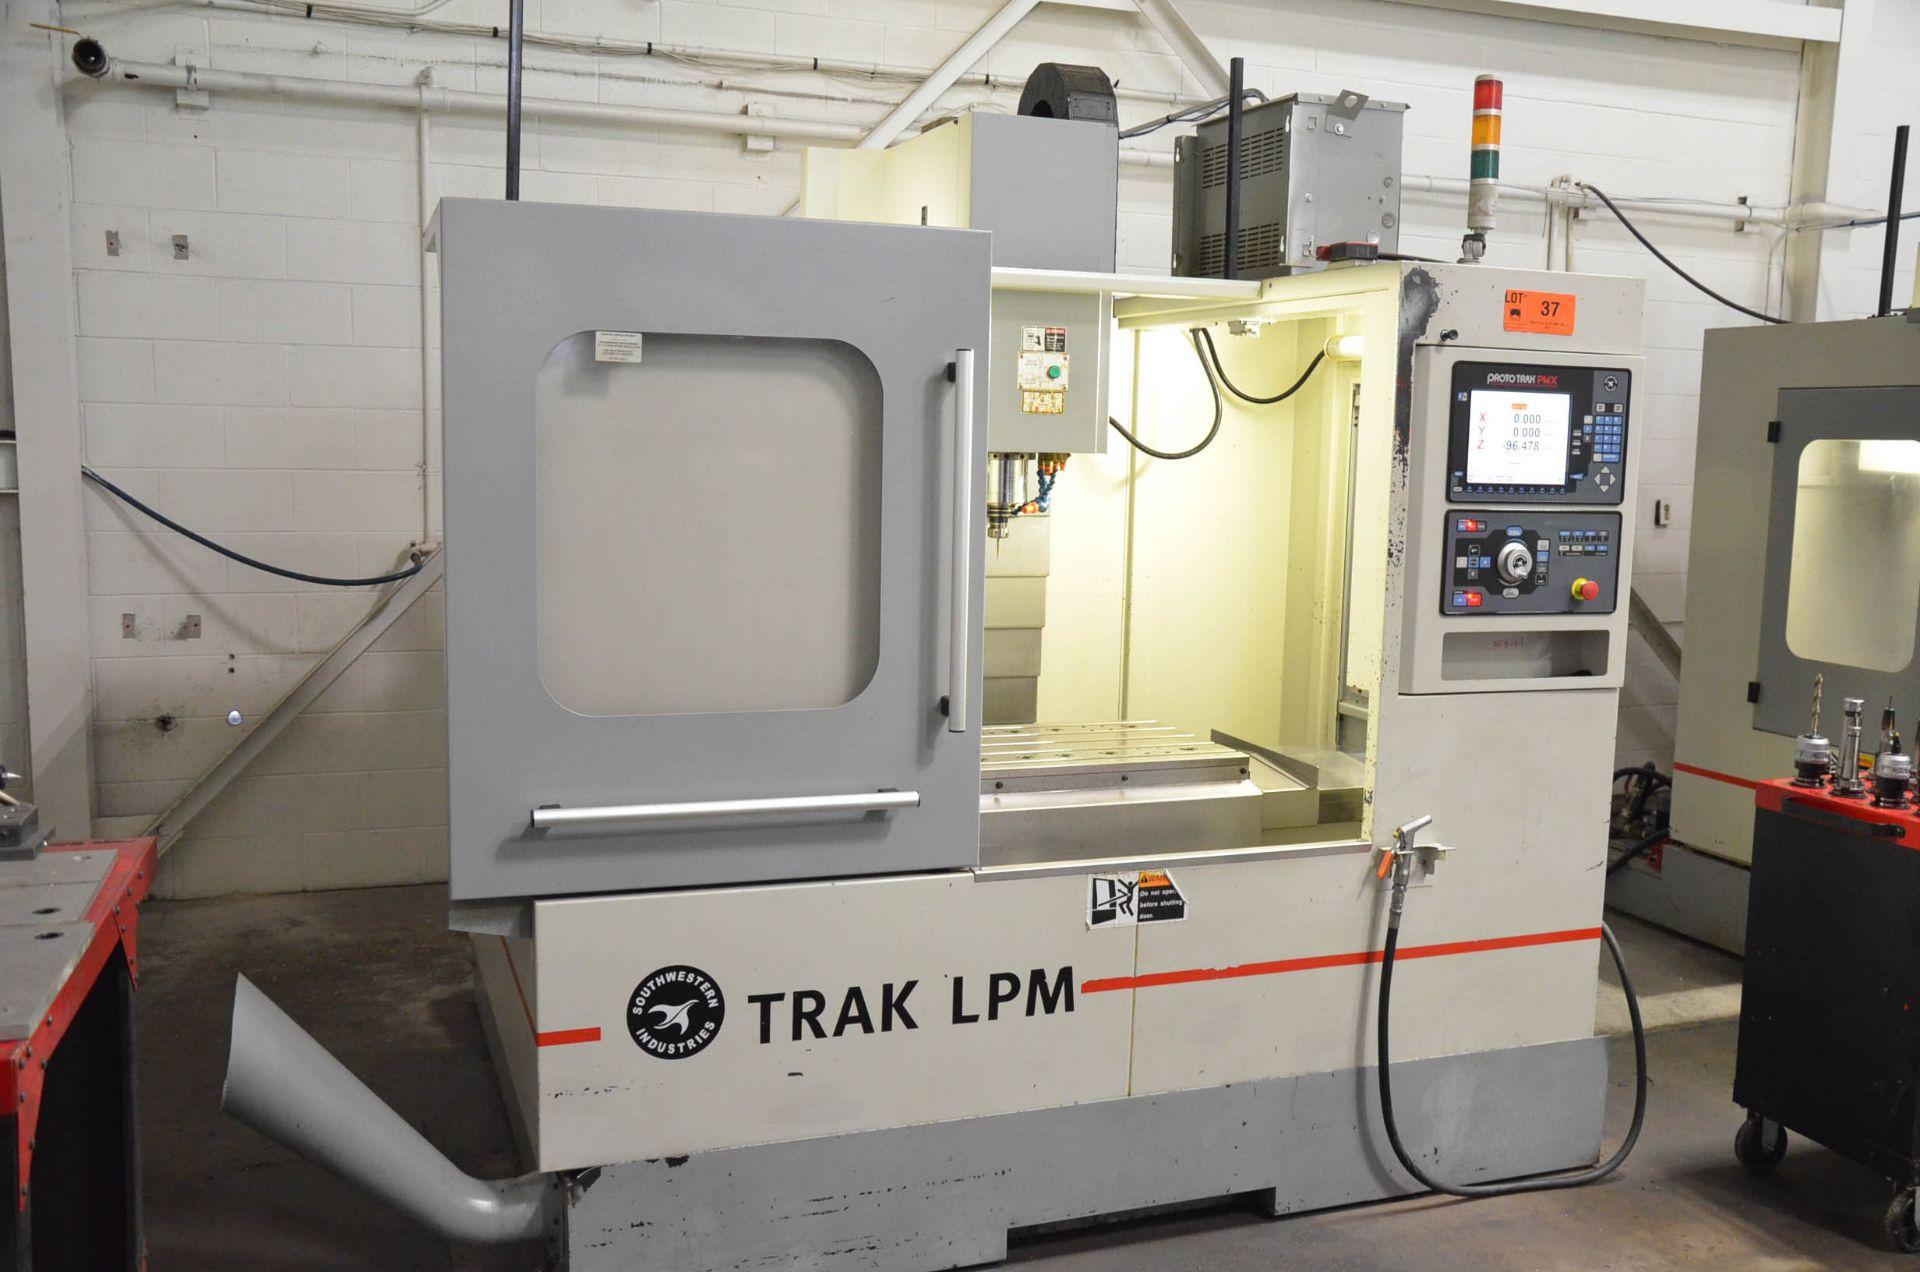 SWI (2012) TRAK LPM 4-AXIS READY CNC VERTICAL MACHINING CENTER WITH PROTO TRAK PMX CNC CONTROL, 19. - Image 2 of 10